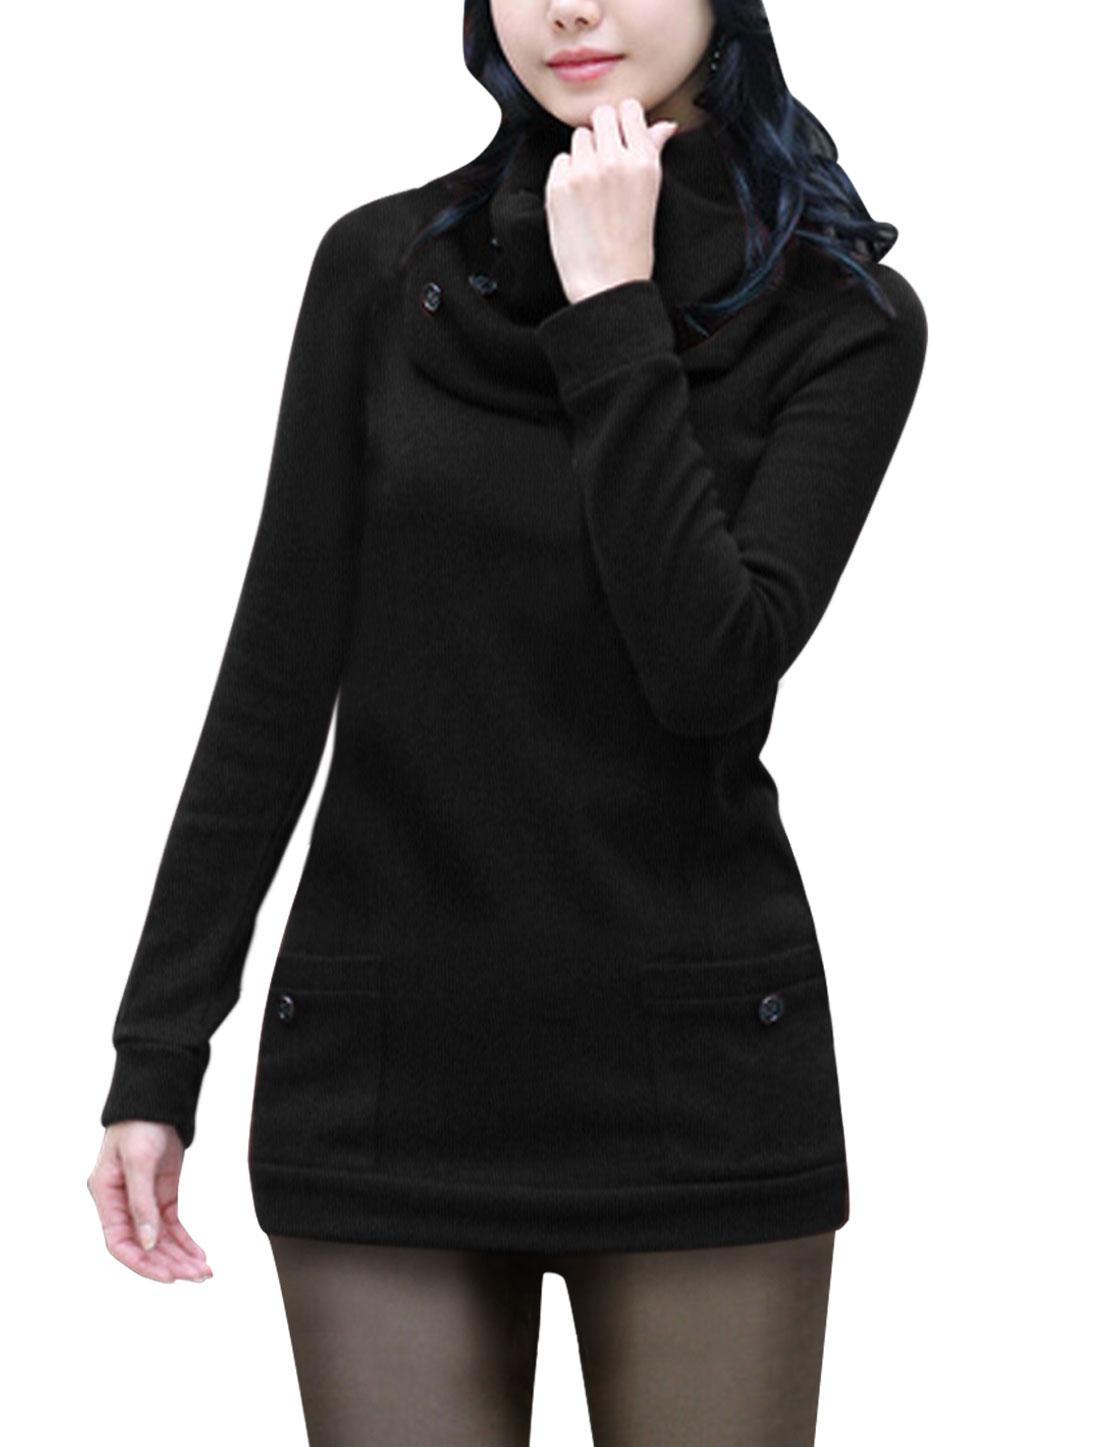 Woman Button Decor Neck Warmer Long Sleeve Round Neck Shirt Black XS